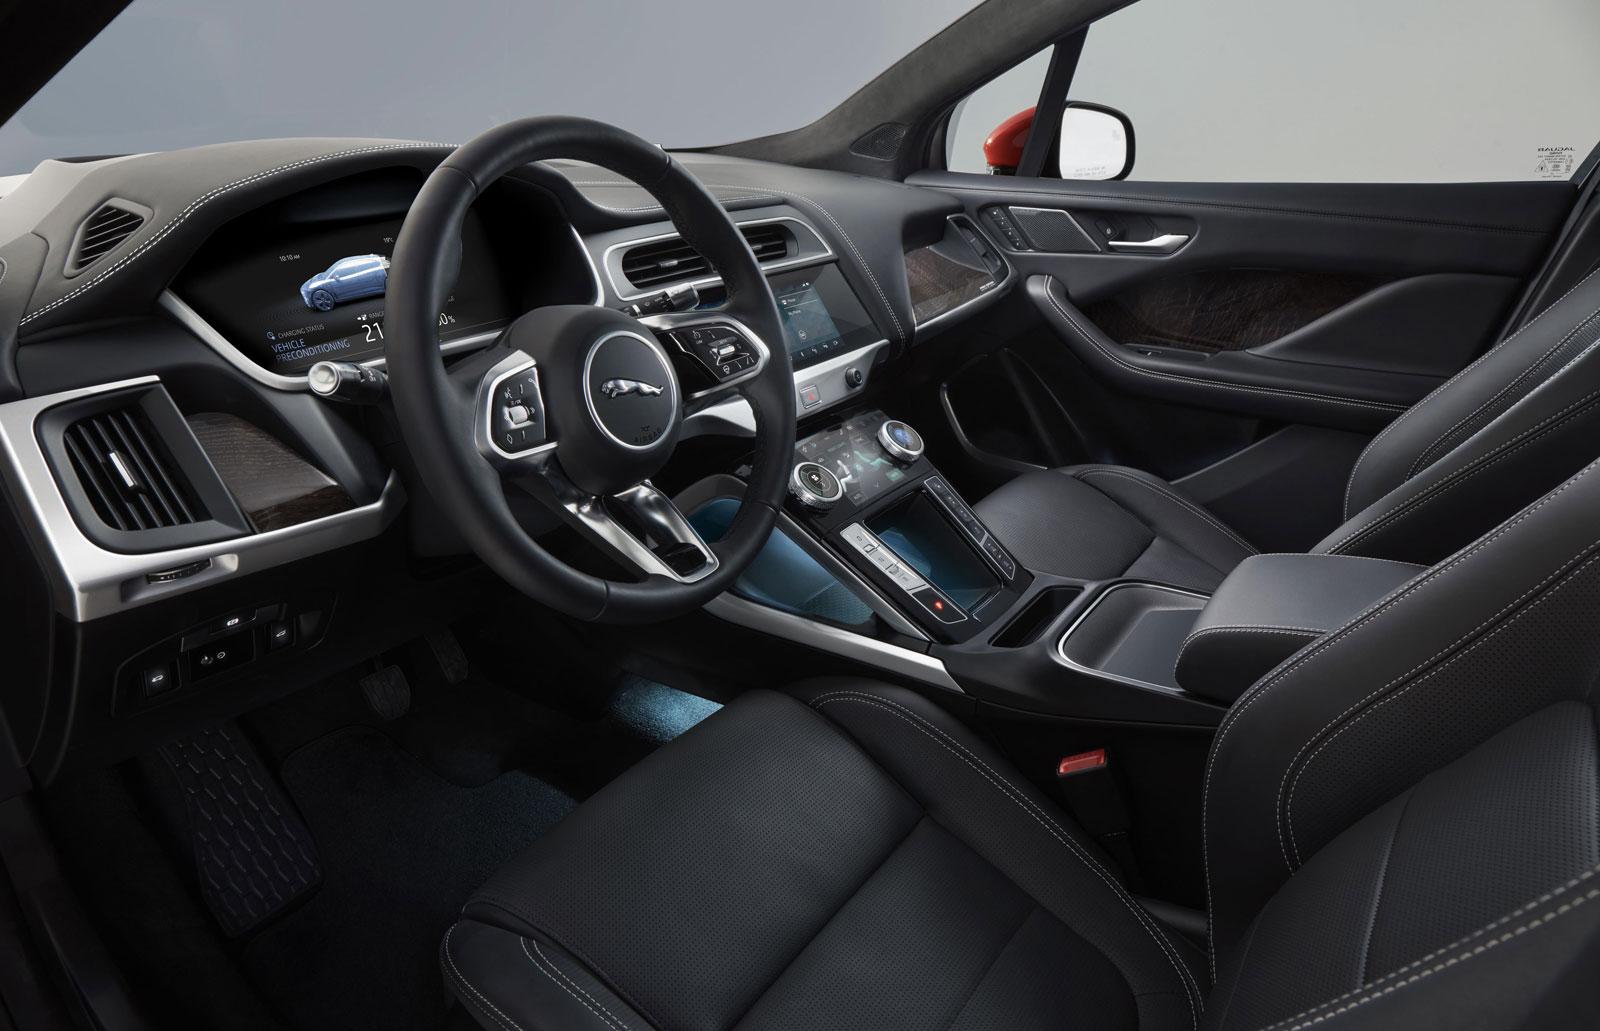 Automotive Design Schools Online